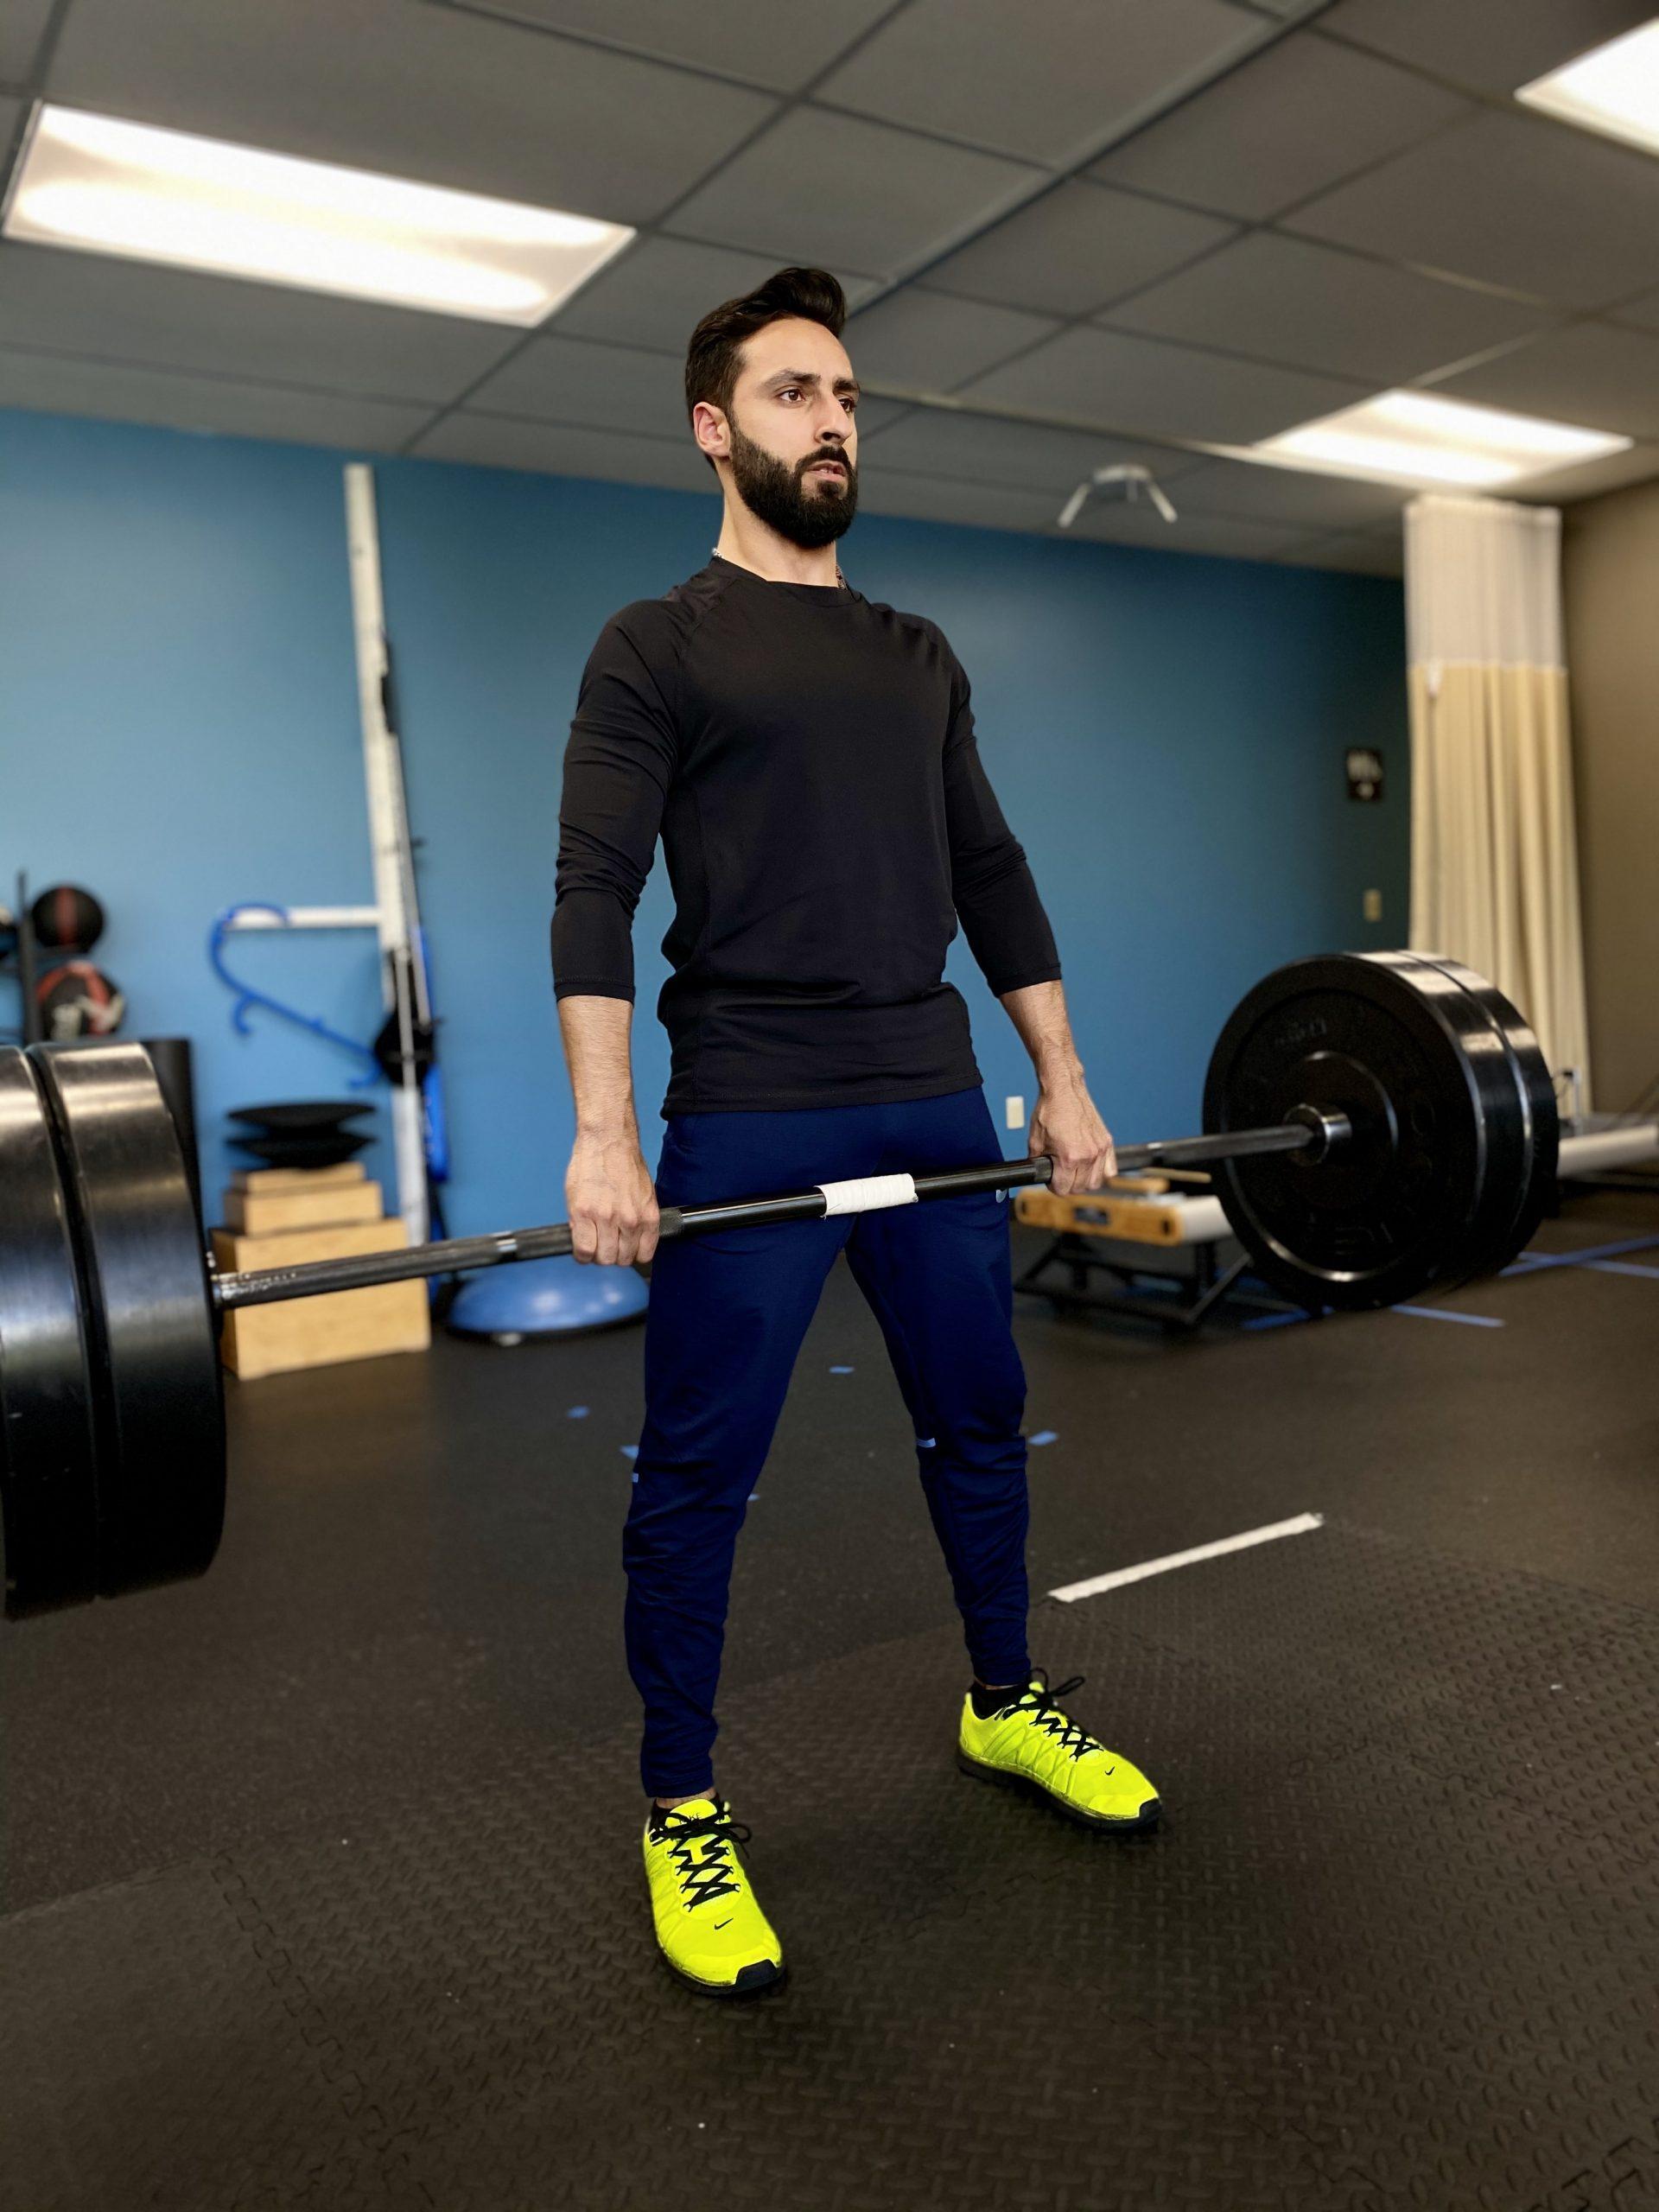 Dr. Ashok Bhandari lifting weights in a gym